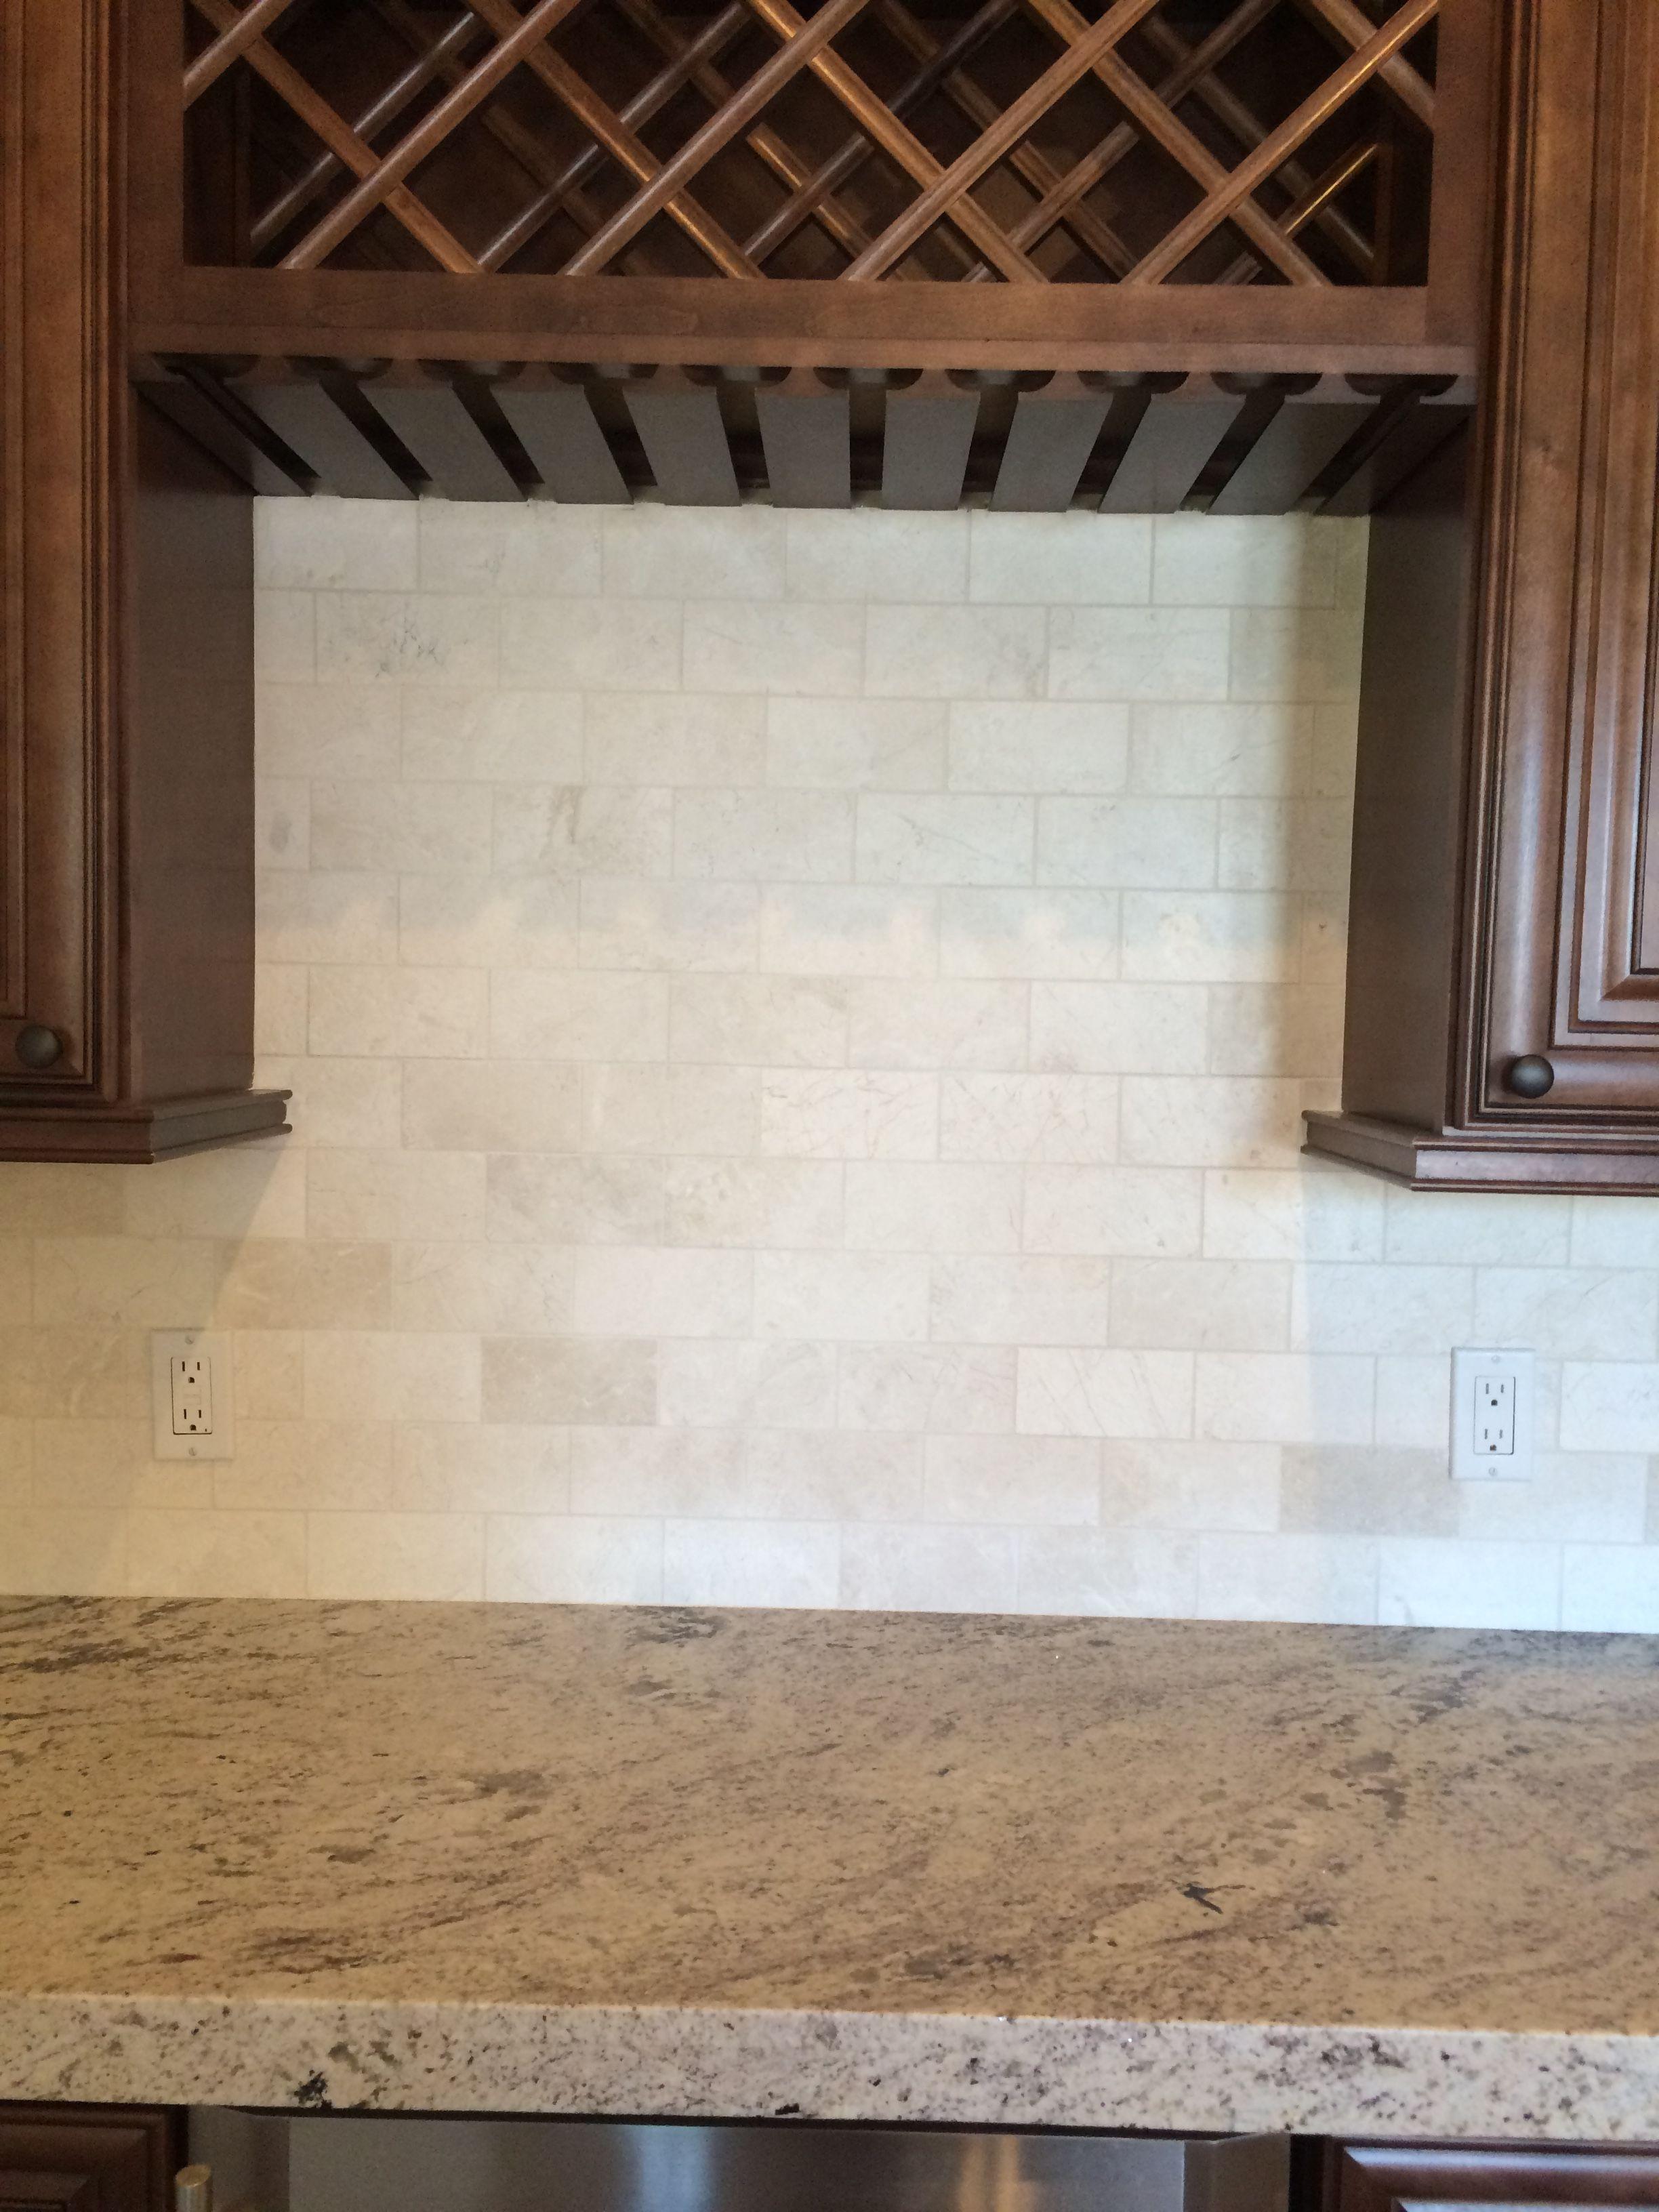 limestone subway tile backsplash